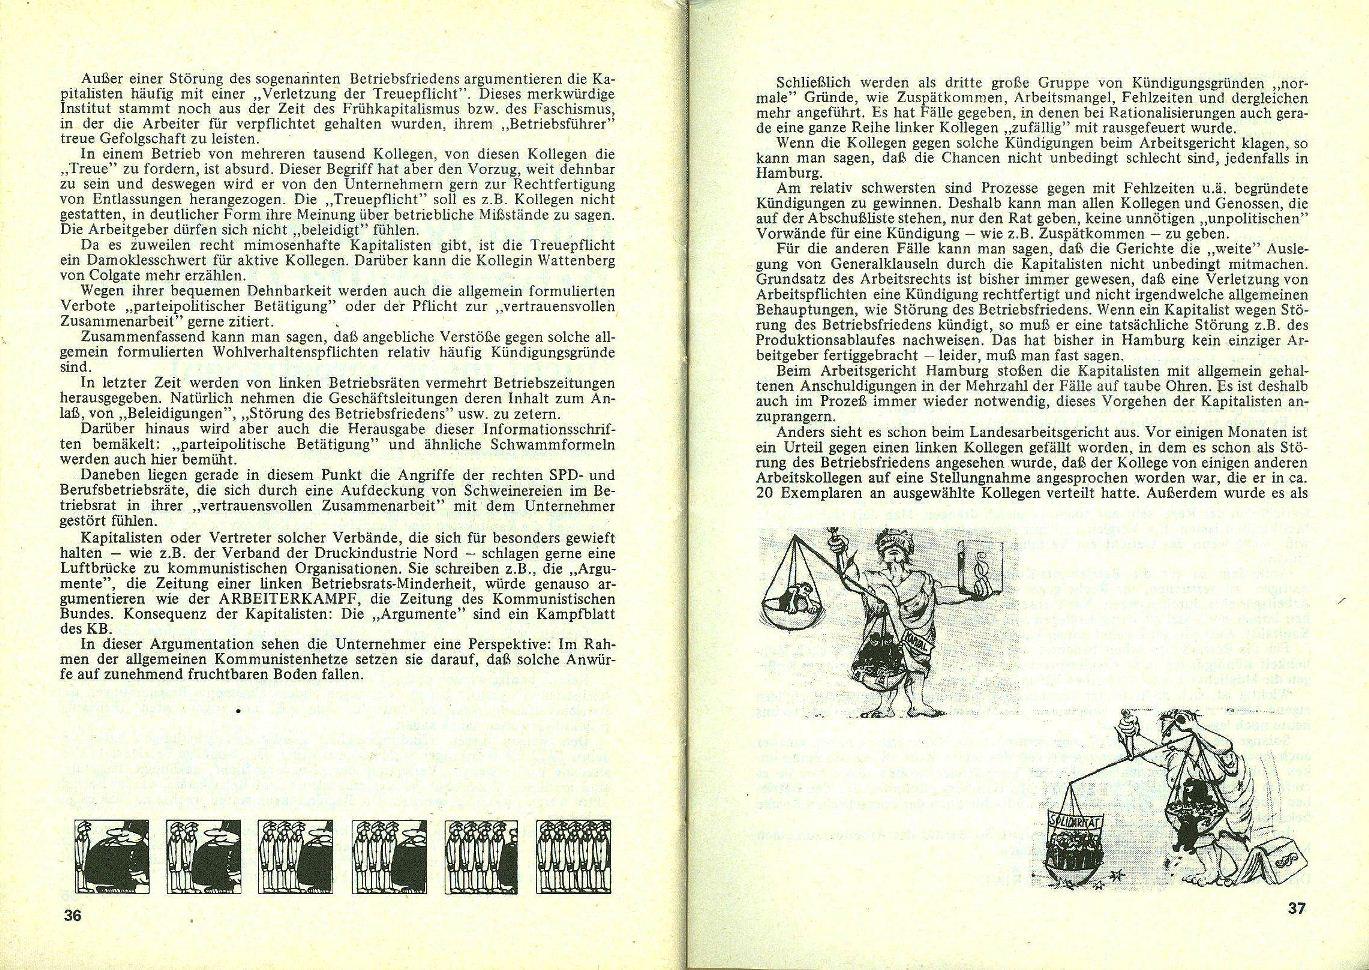 Betriebsraeteveranstaltung_1975_019